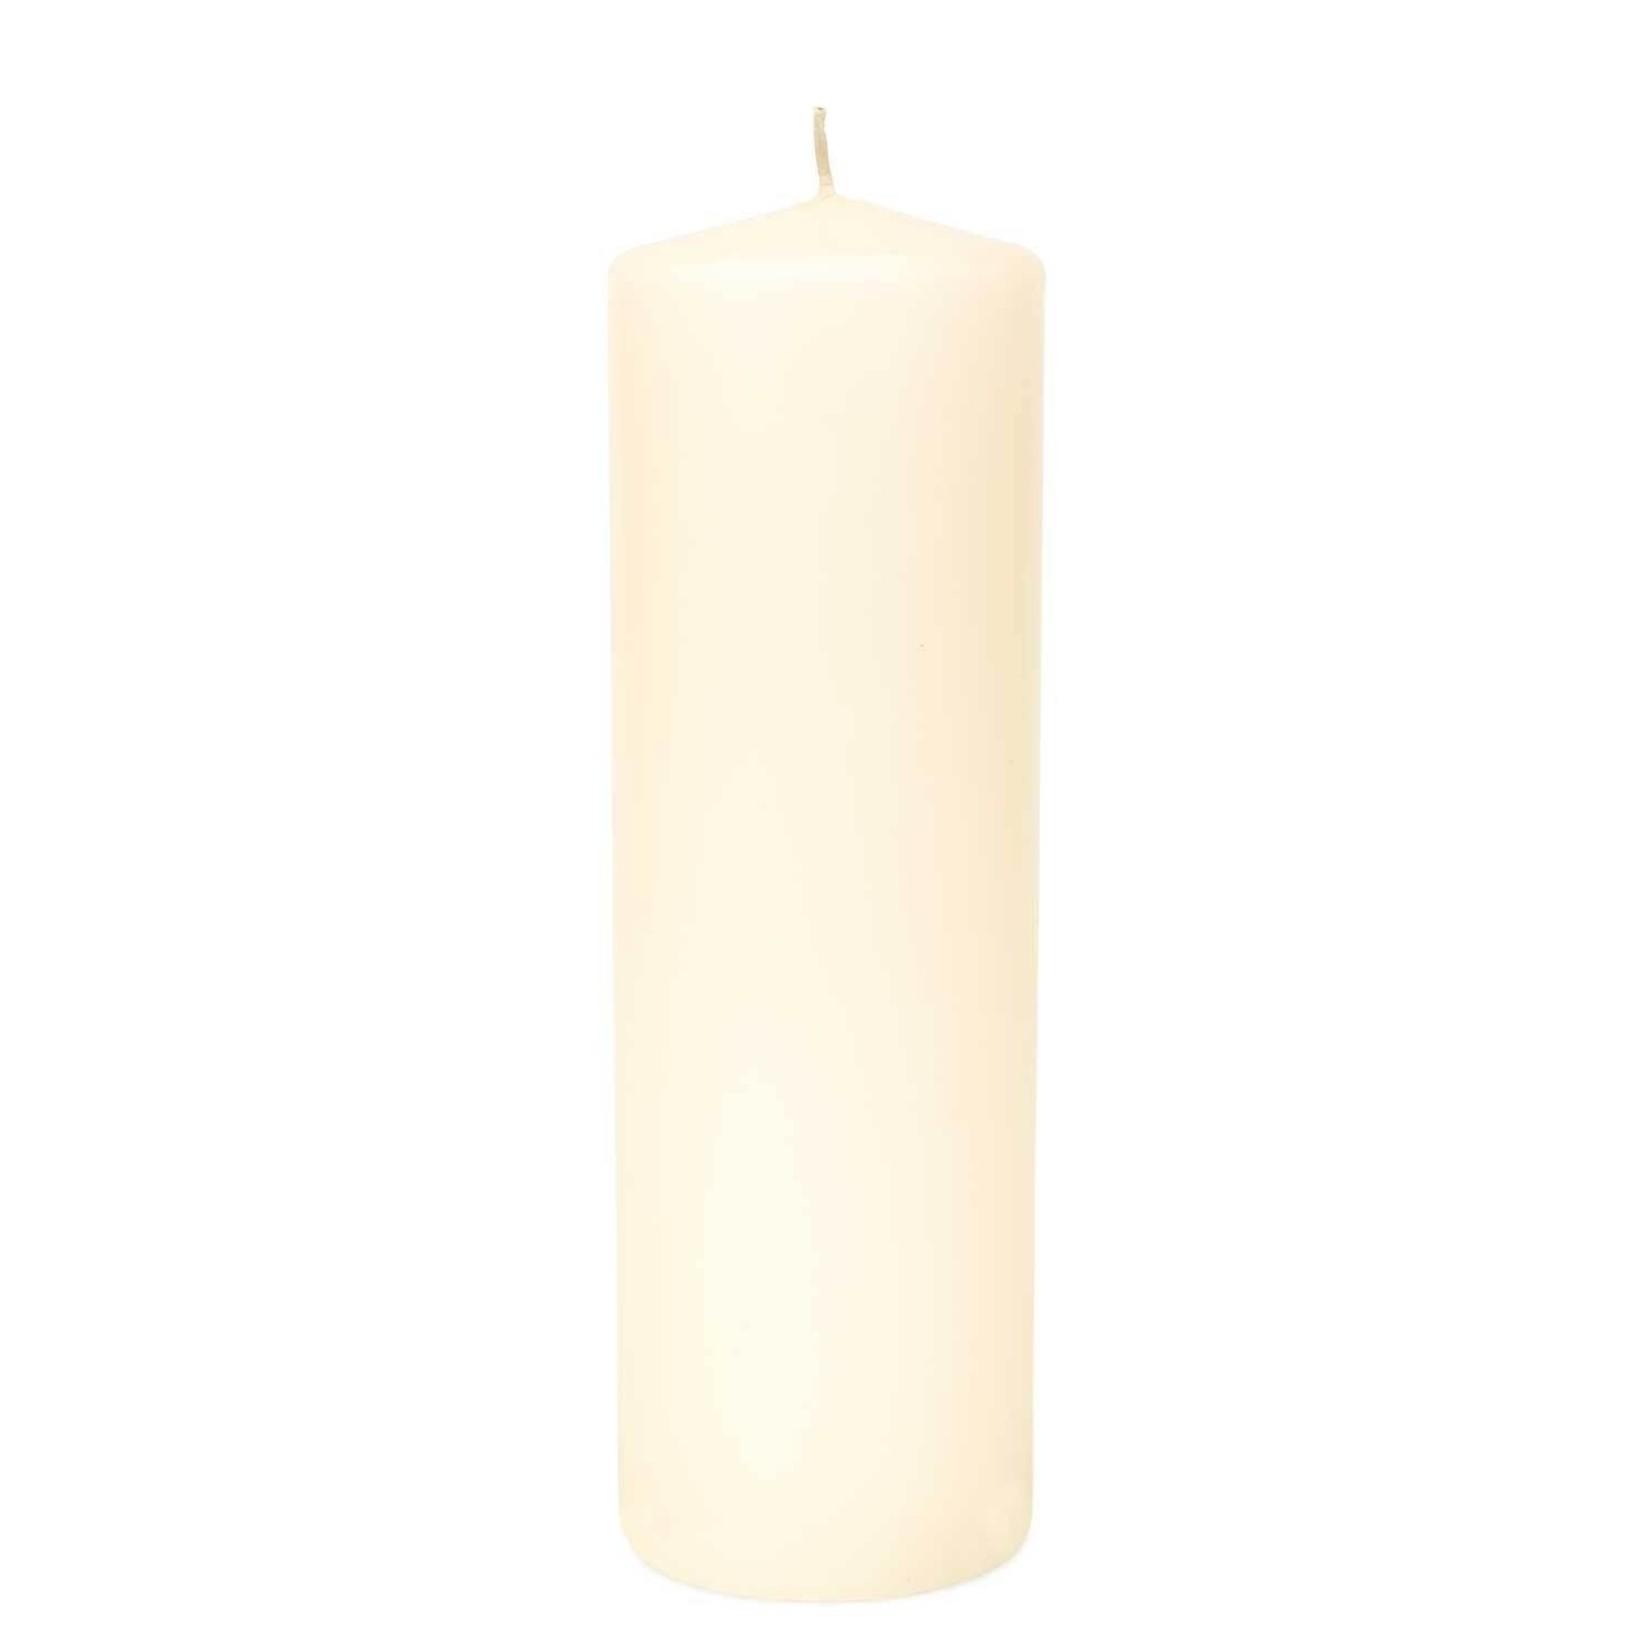 "3""""X9""""H, IVORY Round Pillar Candle"